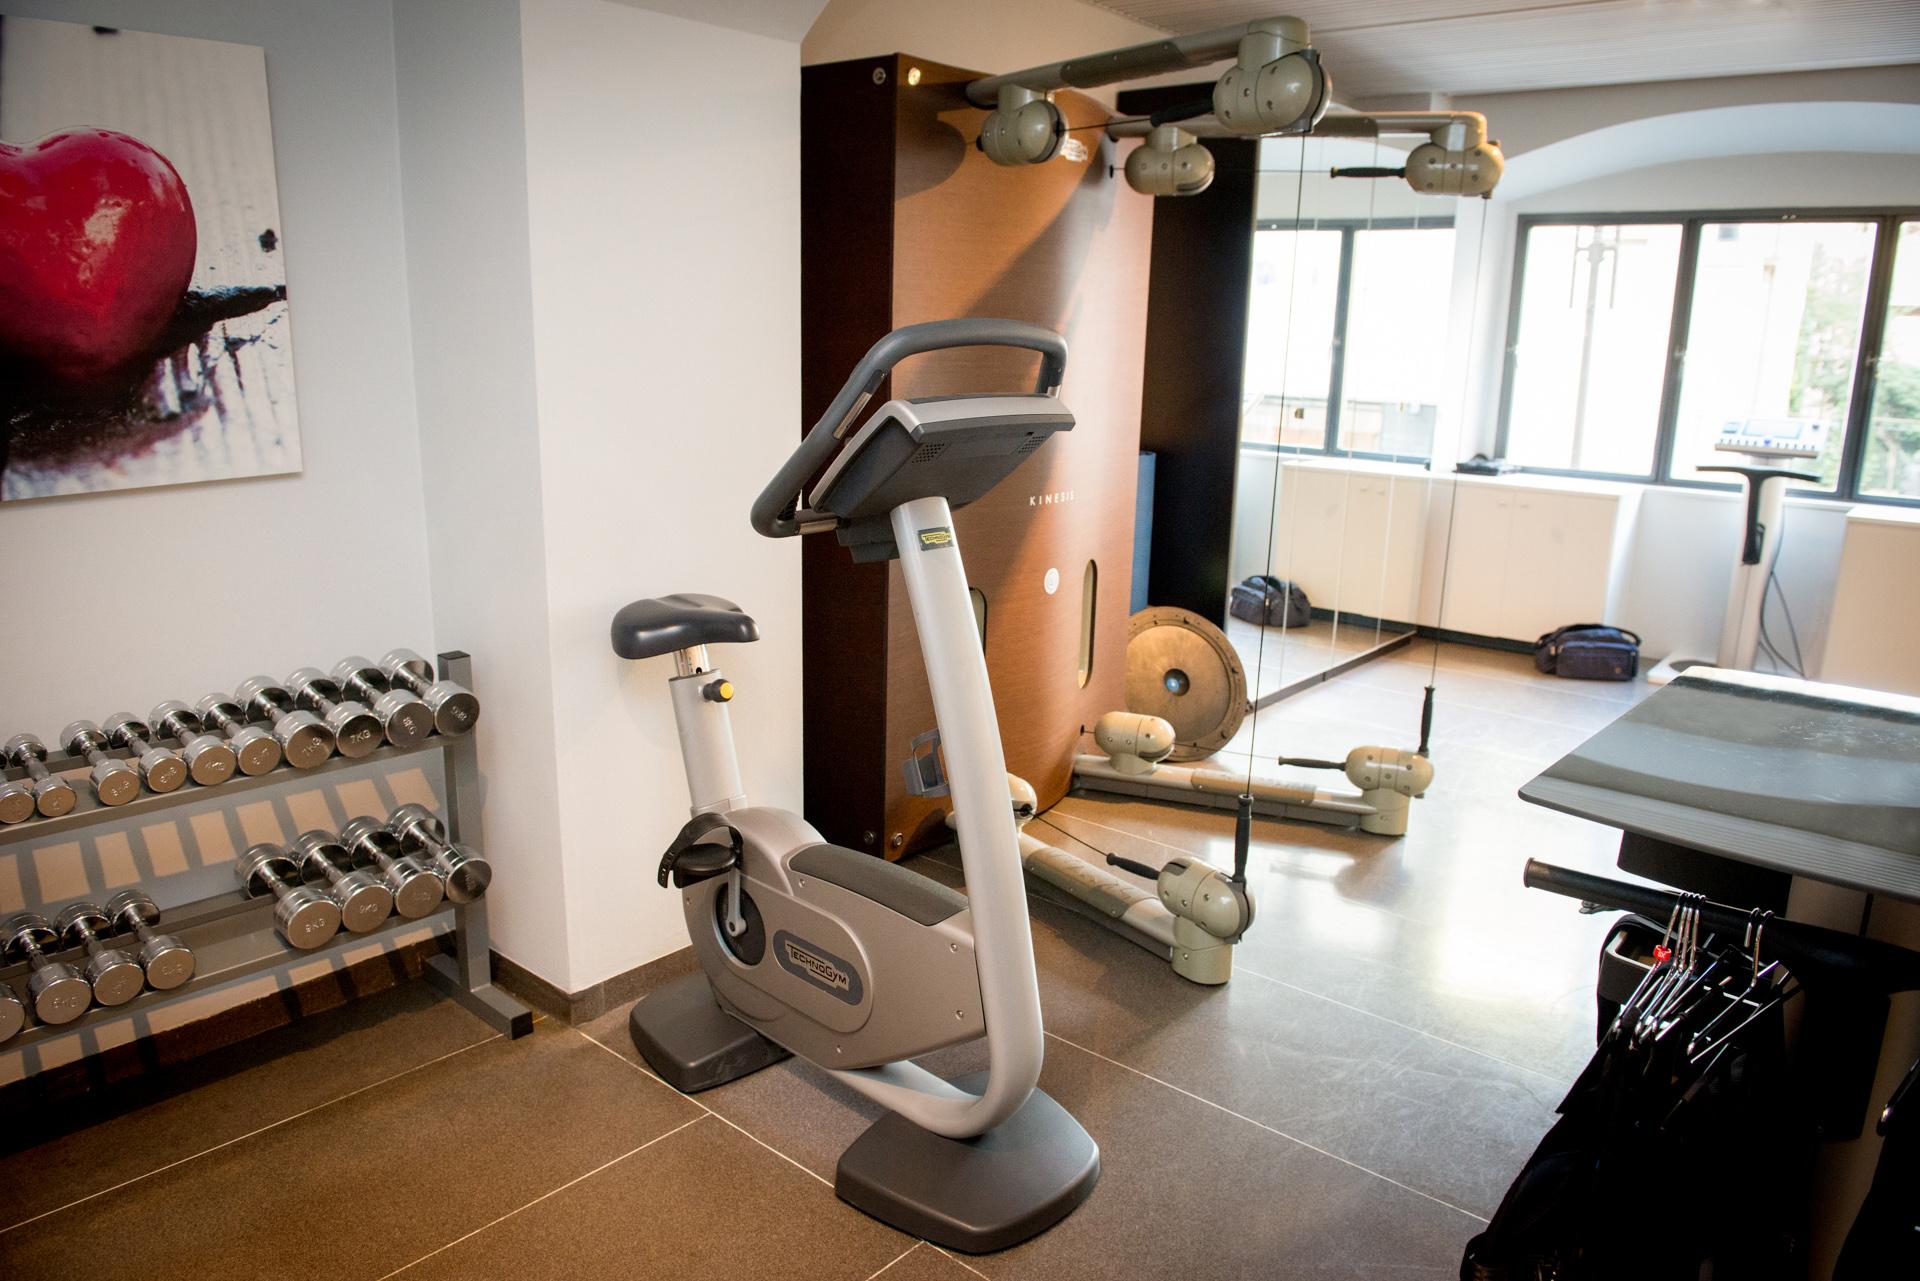 http://www.fisioterapiaizzo.it/wp-content/uploads/2016/10/FIM_0010_r.jpg